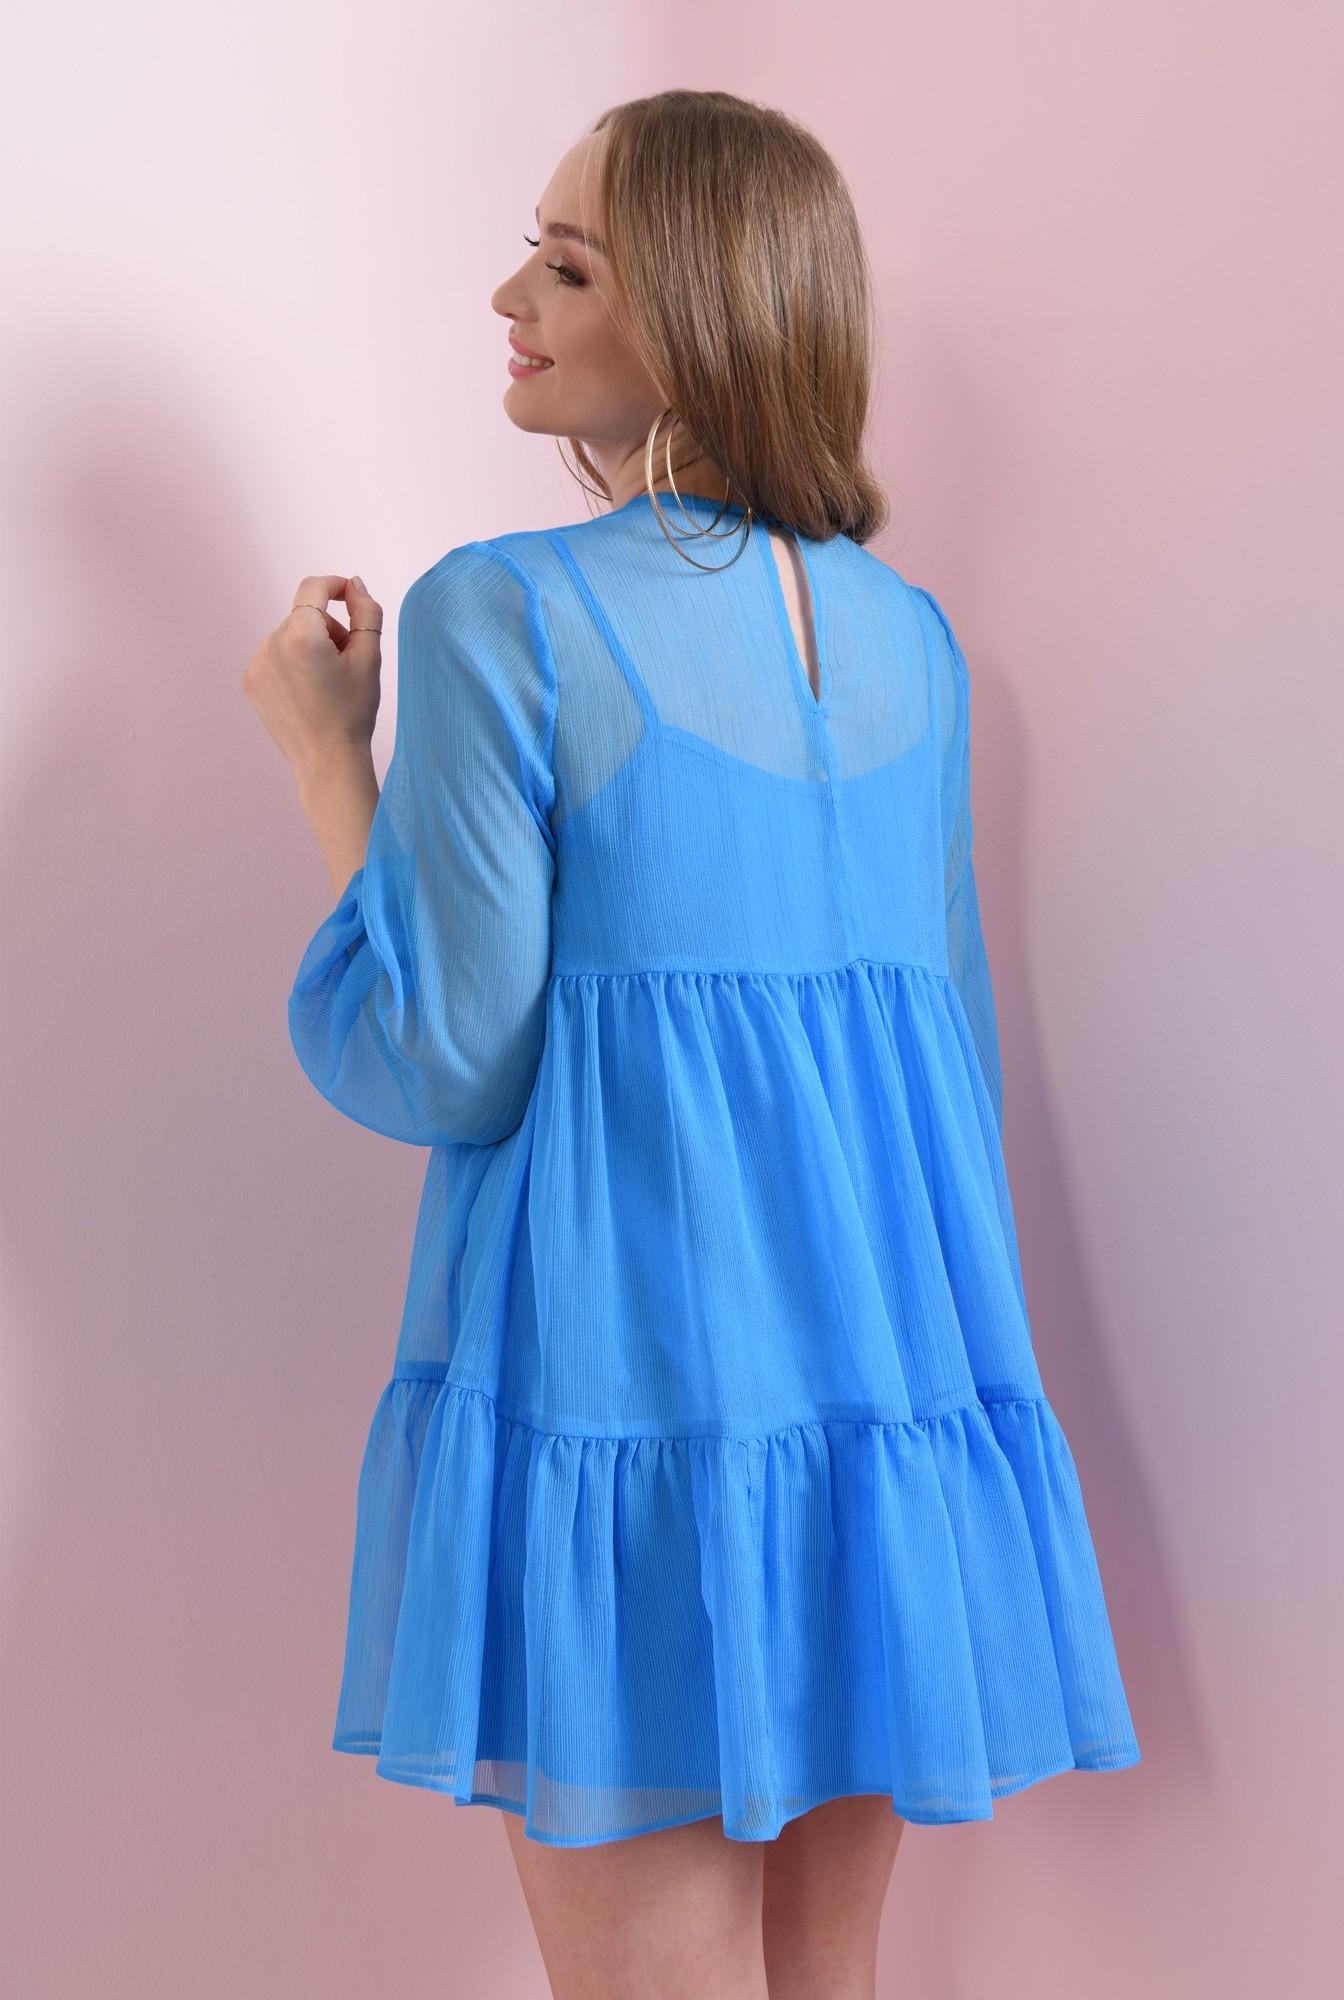 1 - rochie scurta, albastra, babydoll